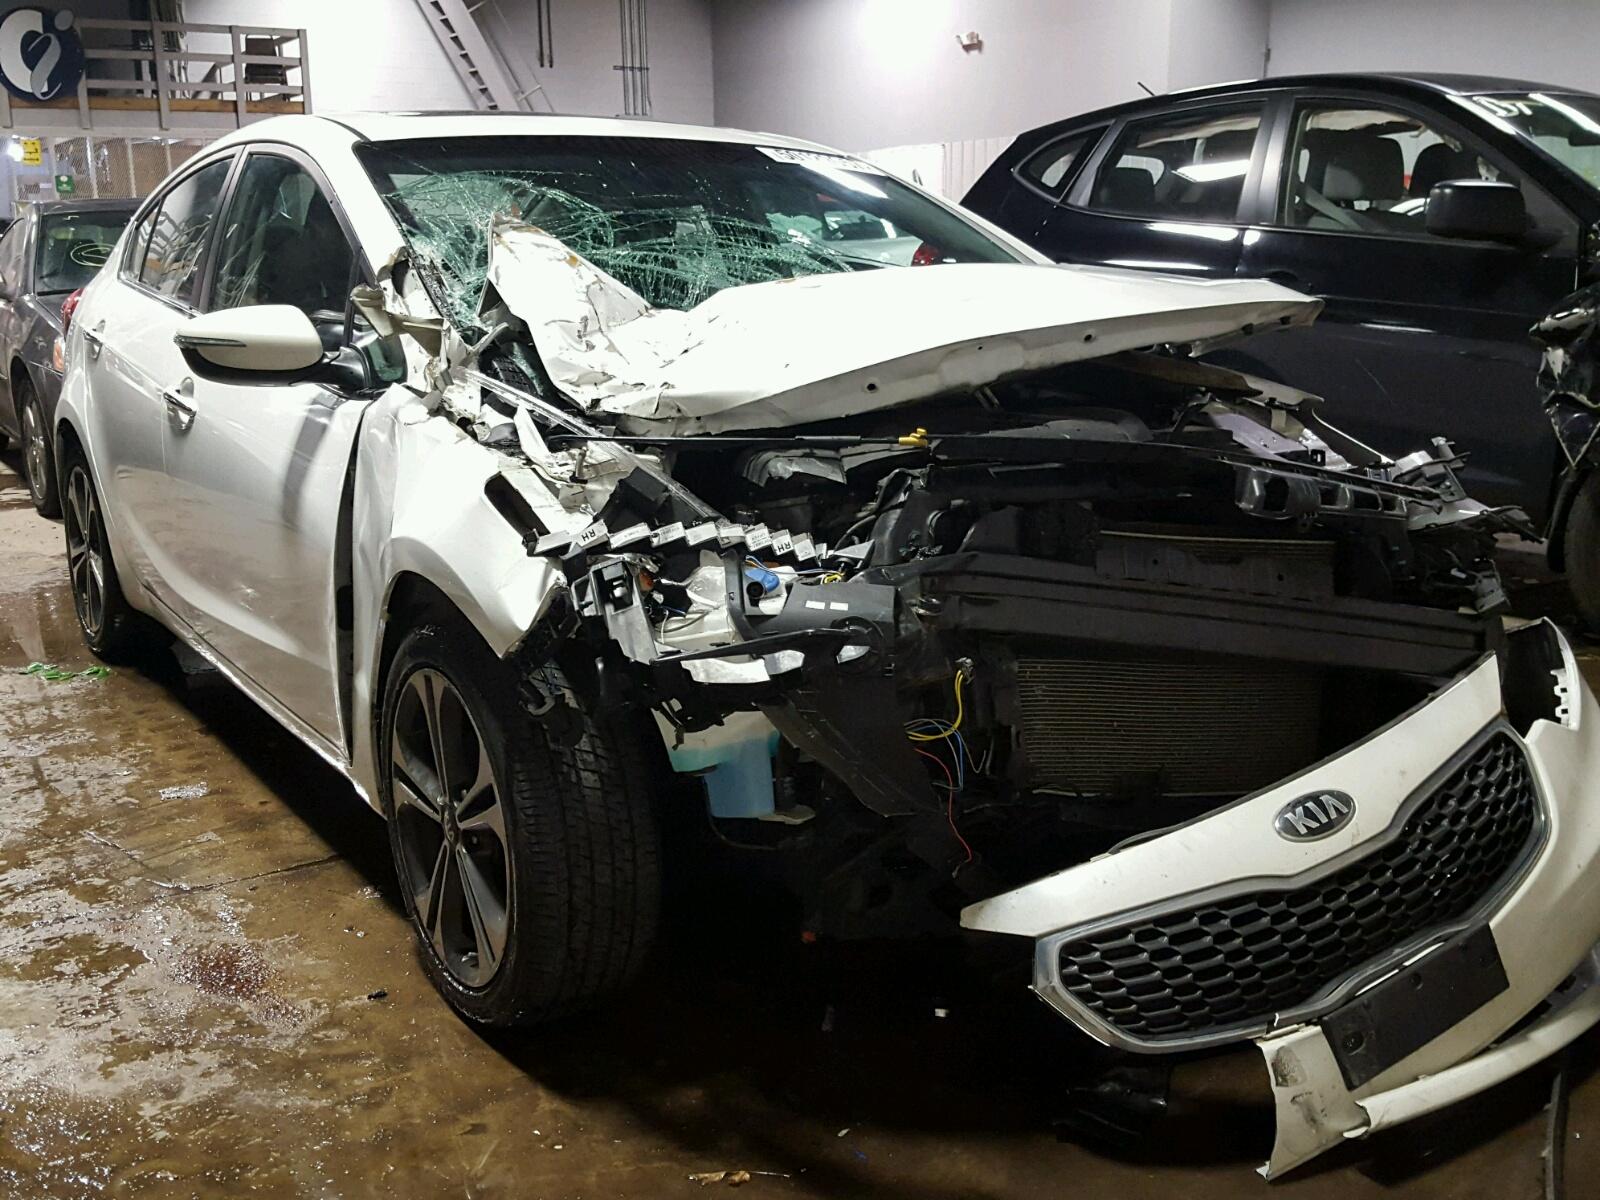 Auto Auction Ended On Vin Knafz4a82e5061336 2014 Kia Forte Ex In Mn Cerato 2013 Under Hood Minneapolis North